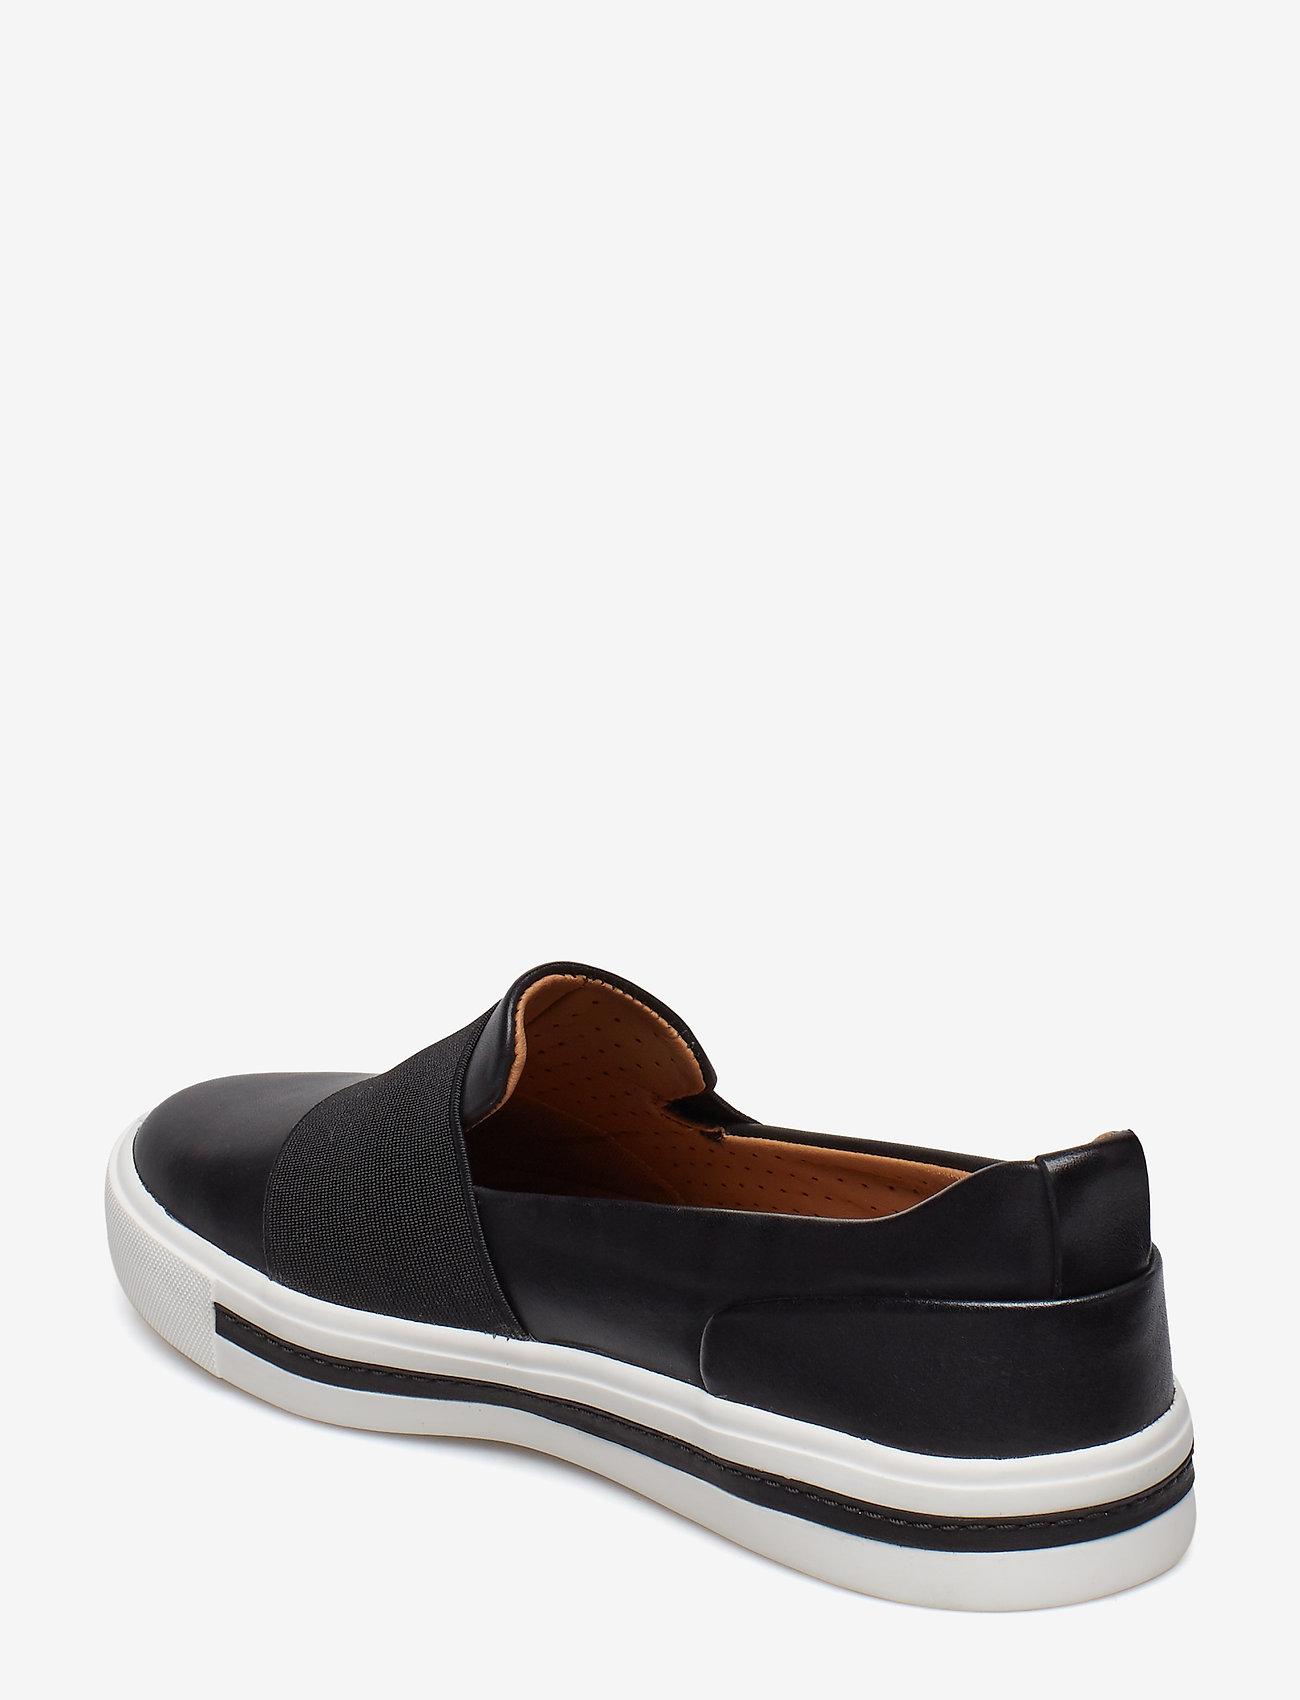 Un Maui Step (Black Leather) - Clarks